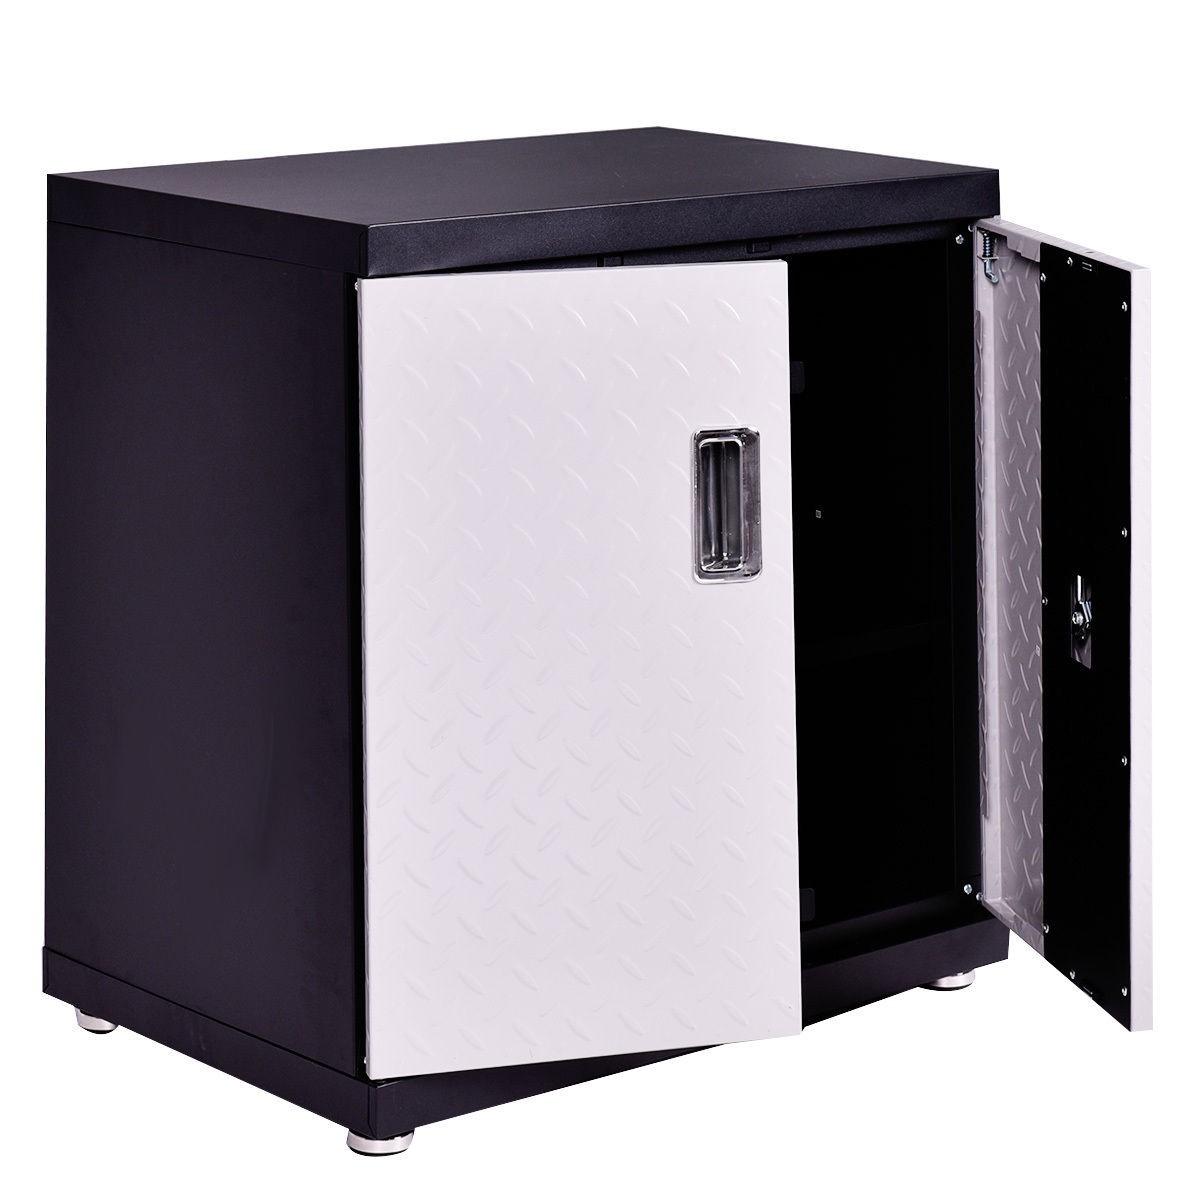 Saw Wall Mount Box : Wall mount cabinet metal garage steel storage box